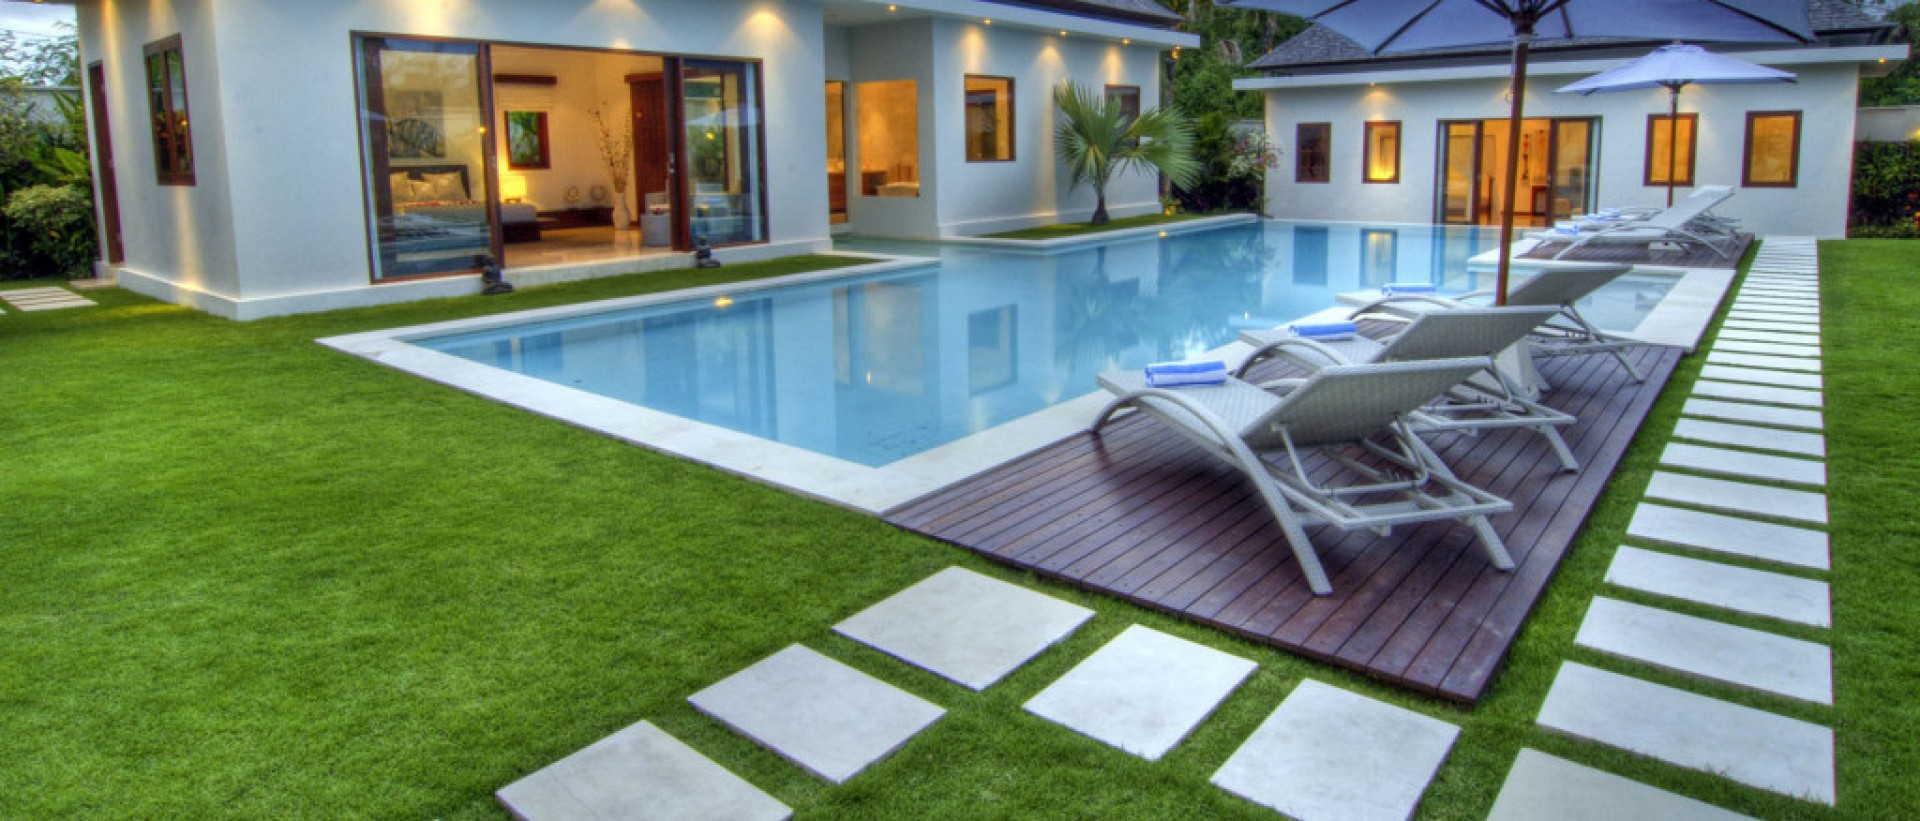 plage piscine en herbe